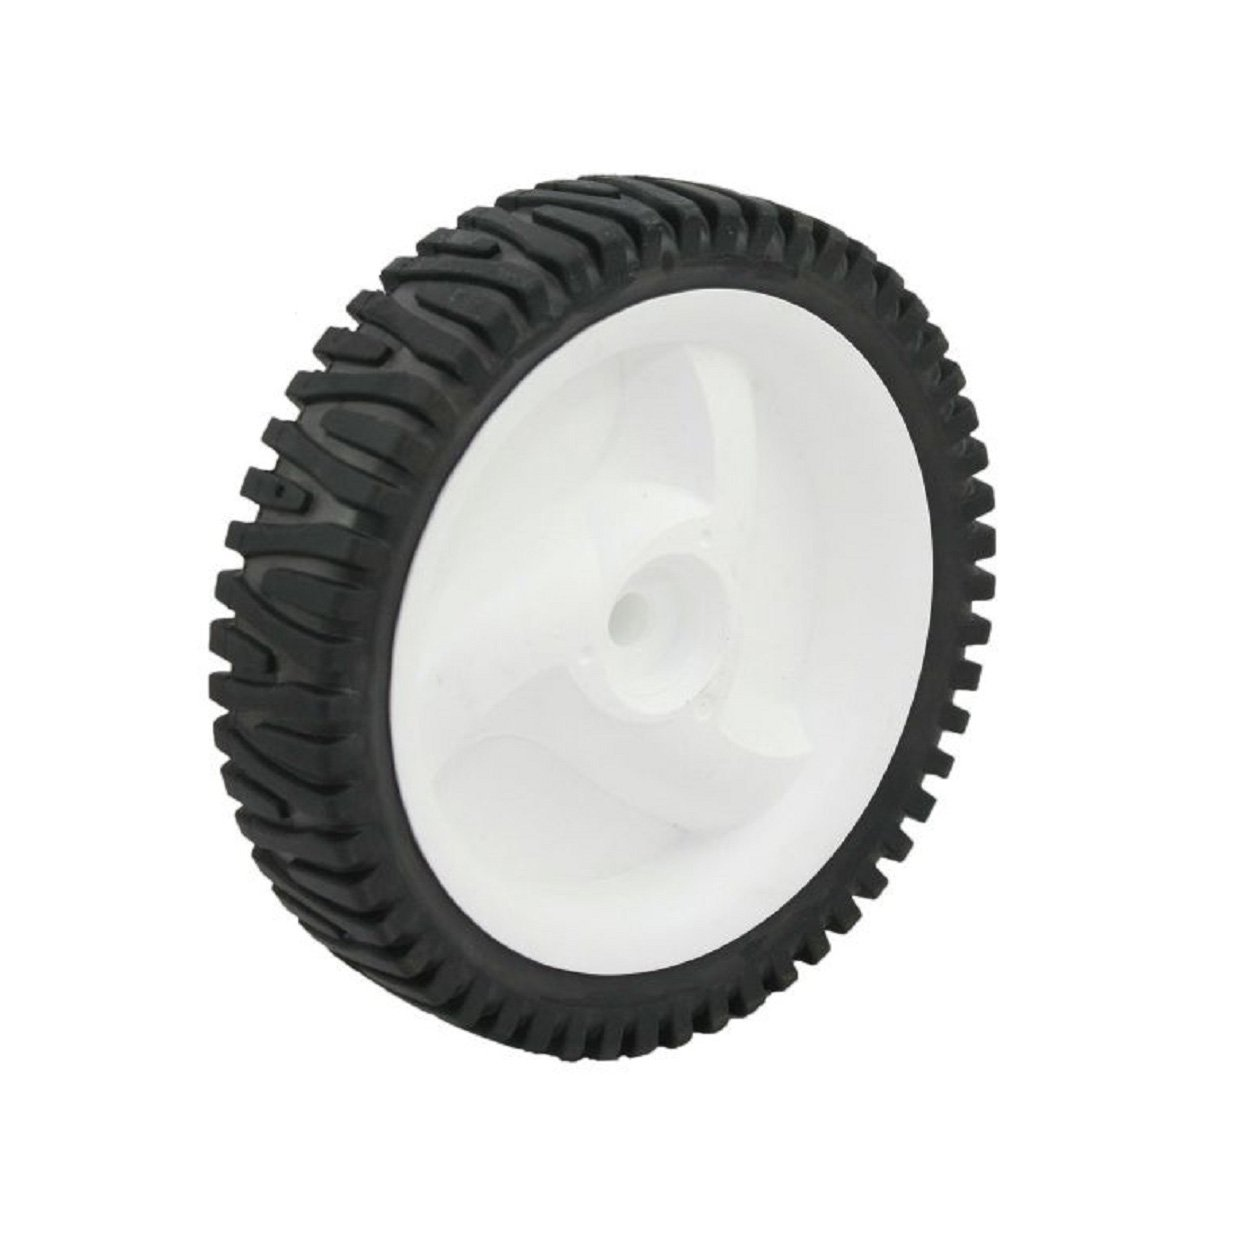 Craftsman 584465301 Rear Wheel by Craftsman